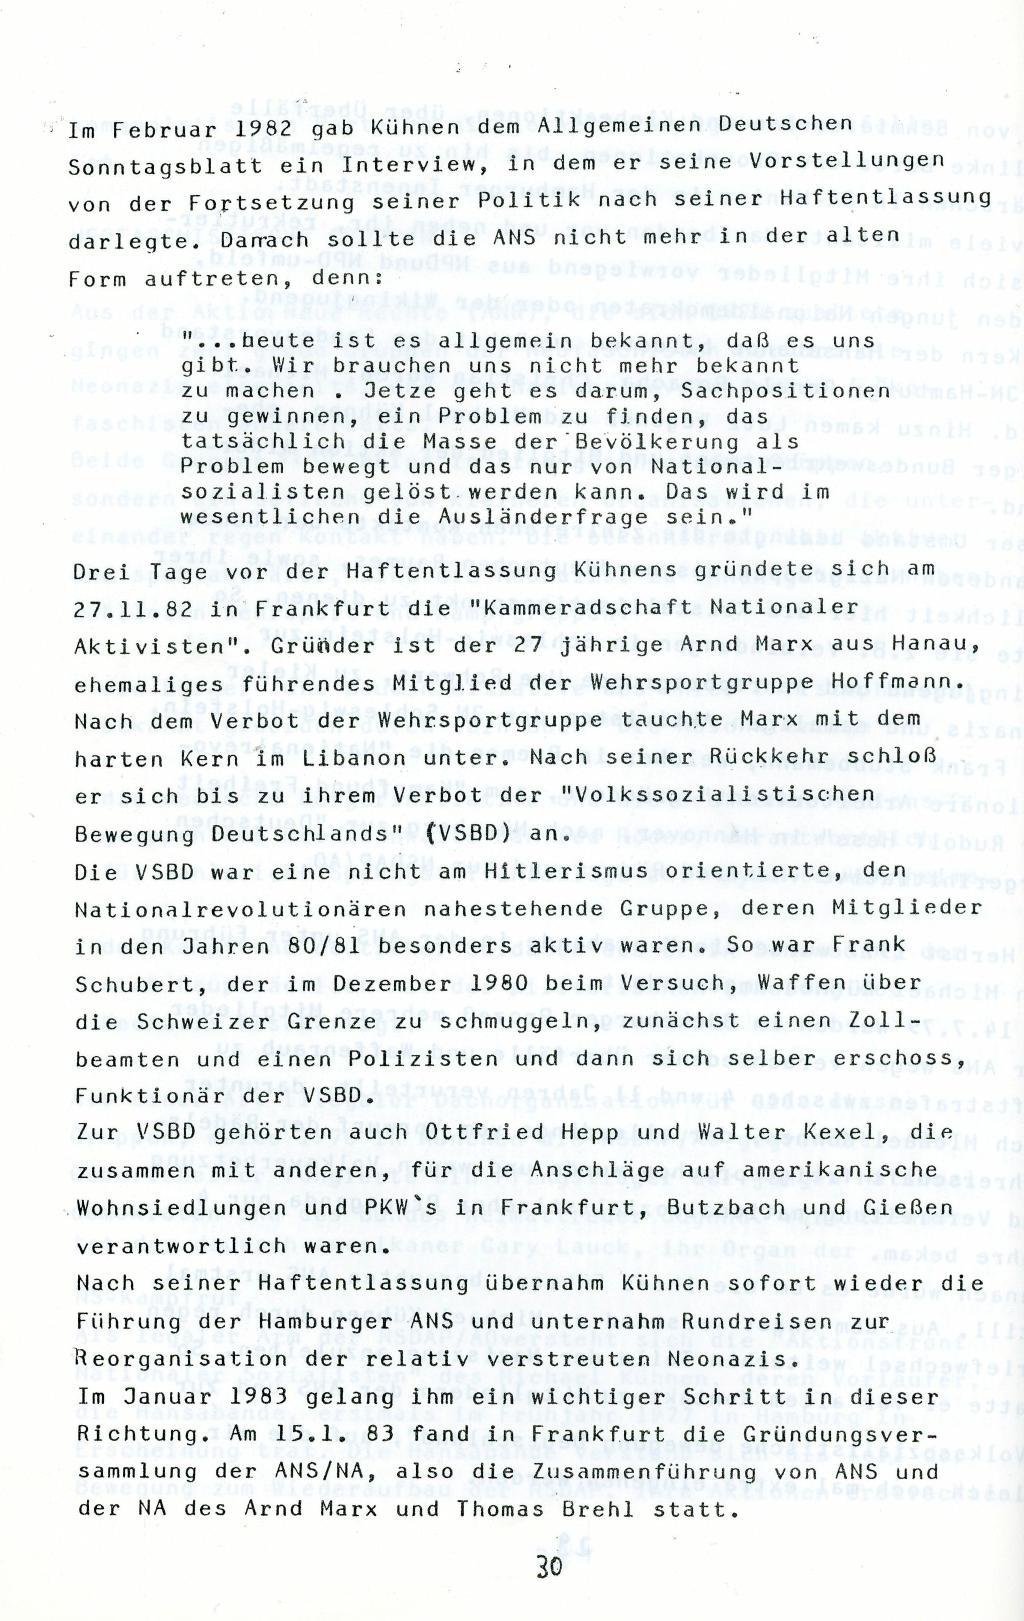 Berlin_1983_Autonome_Gruppen_Faschismus_im_Kapitalismus_30